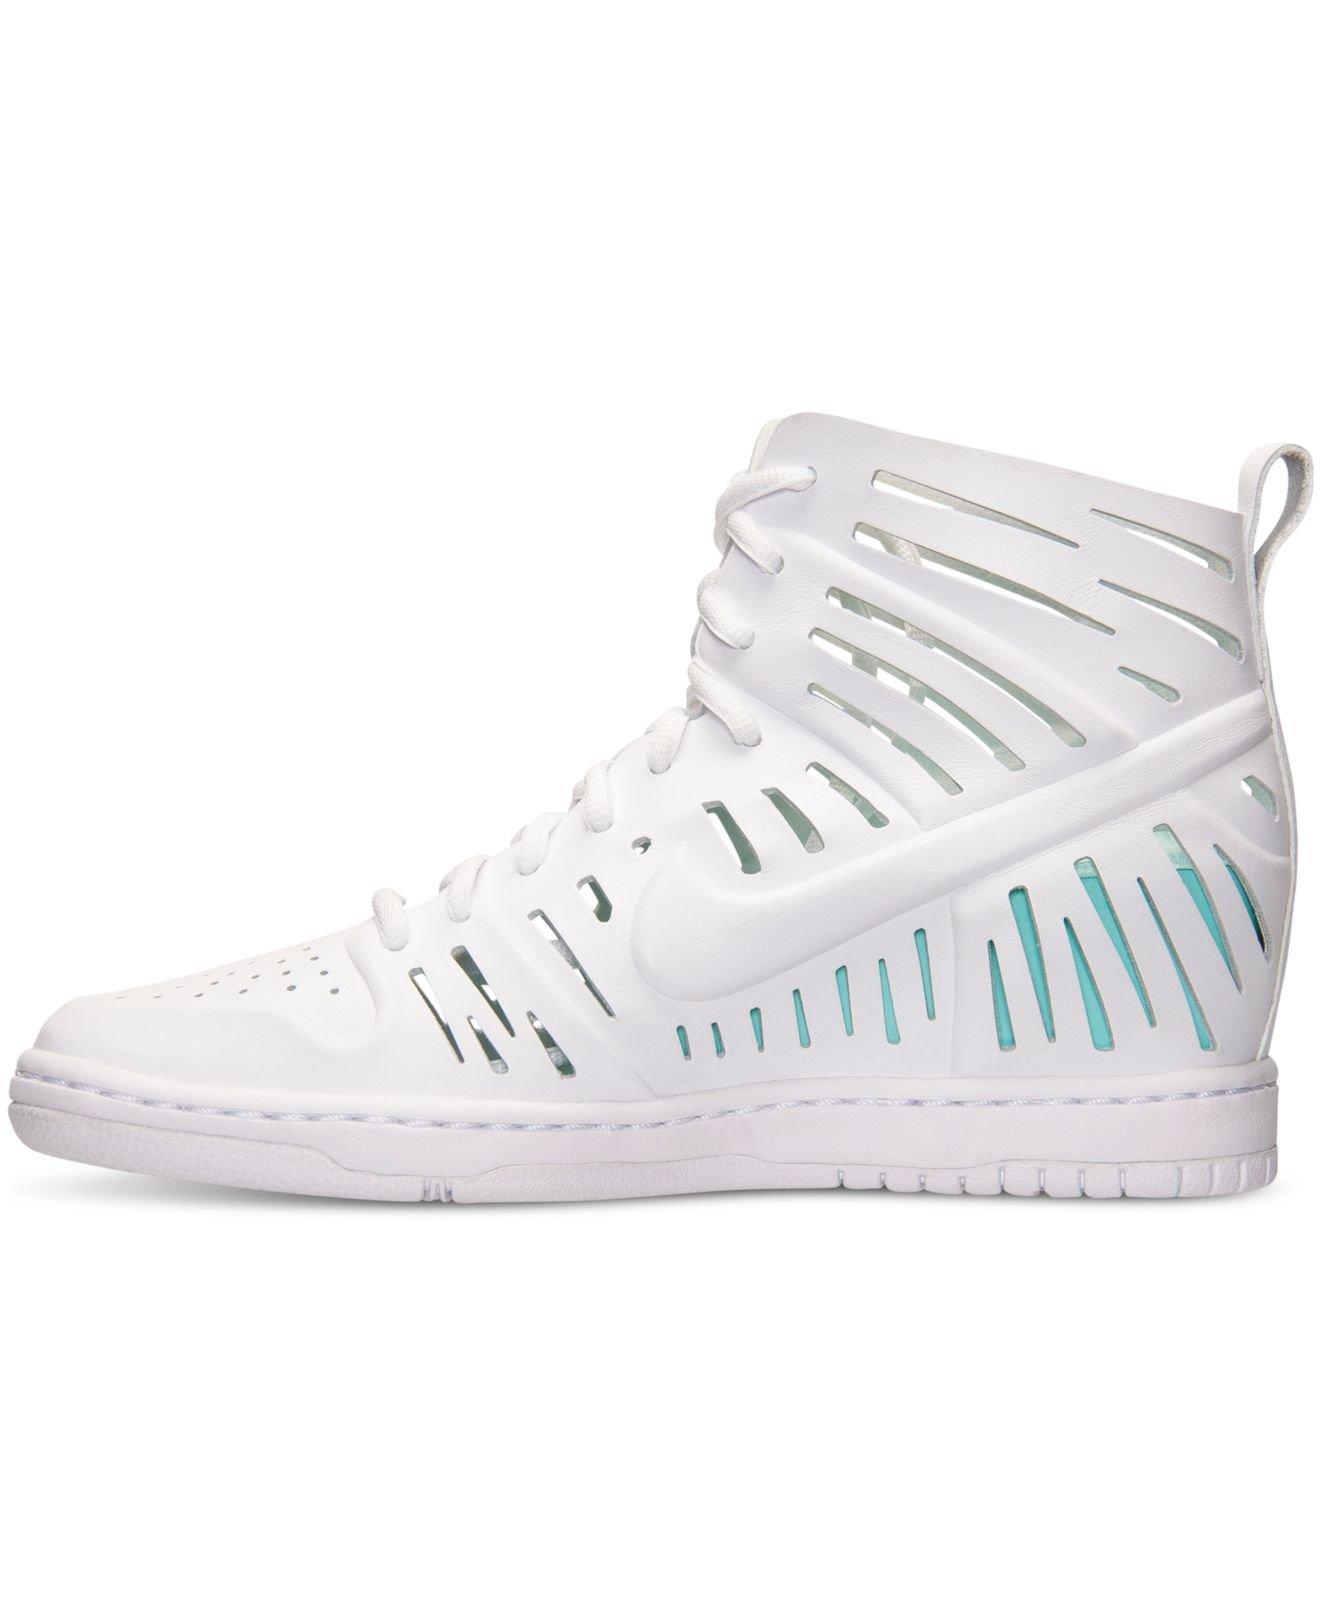 114f5dda4af ... joli white  Previously sold at Macys · Womens Nike Dunk Sky Hi .